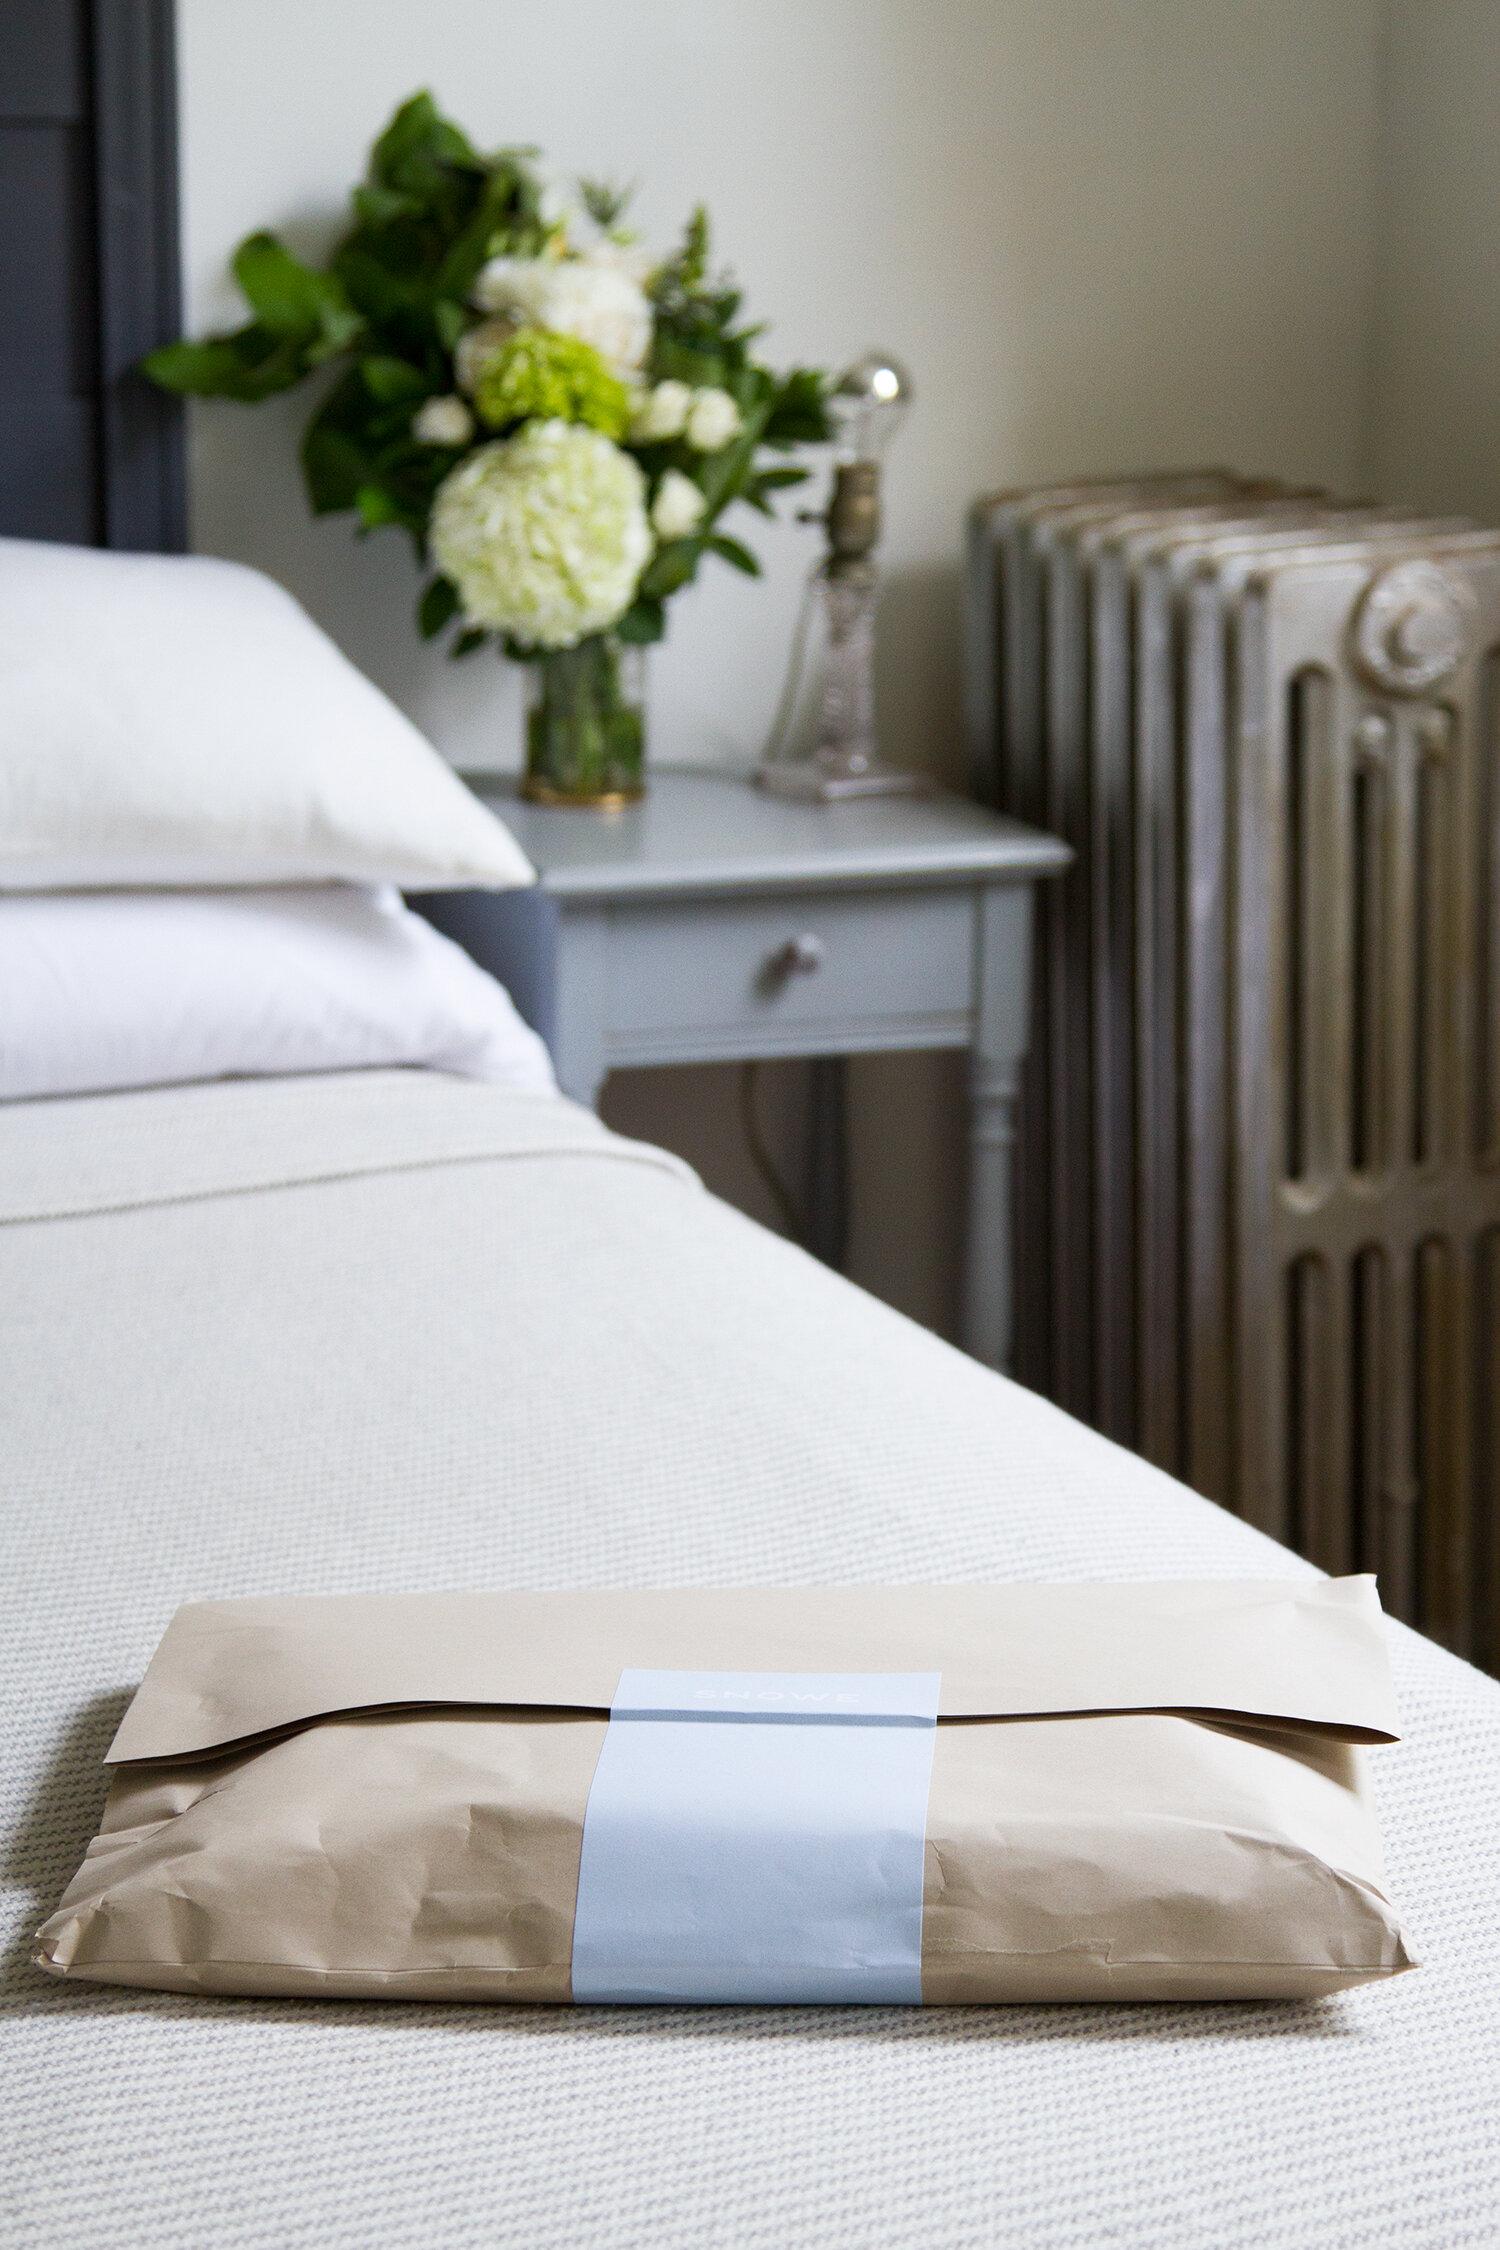 luxury bedding from snowe | reading my tea leaves